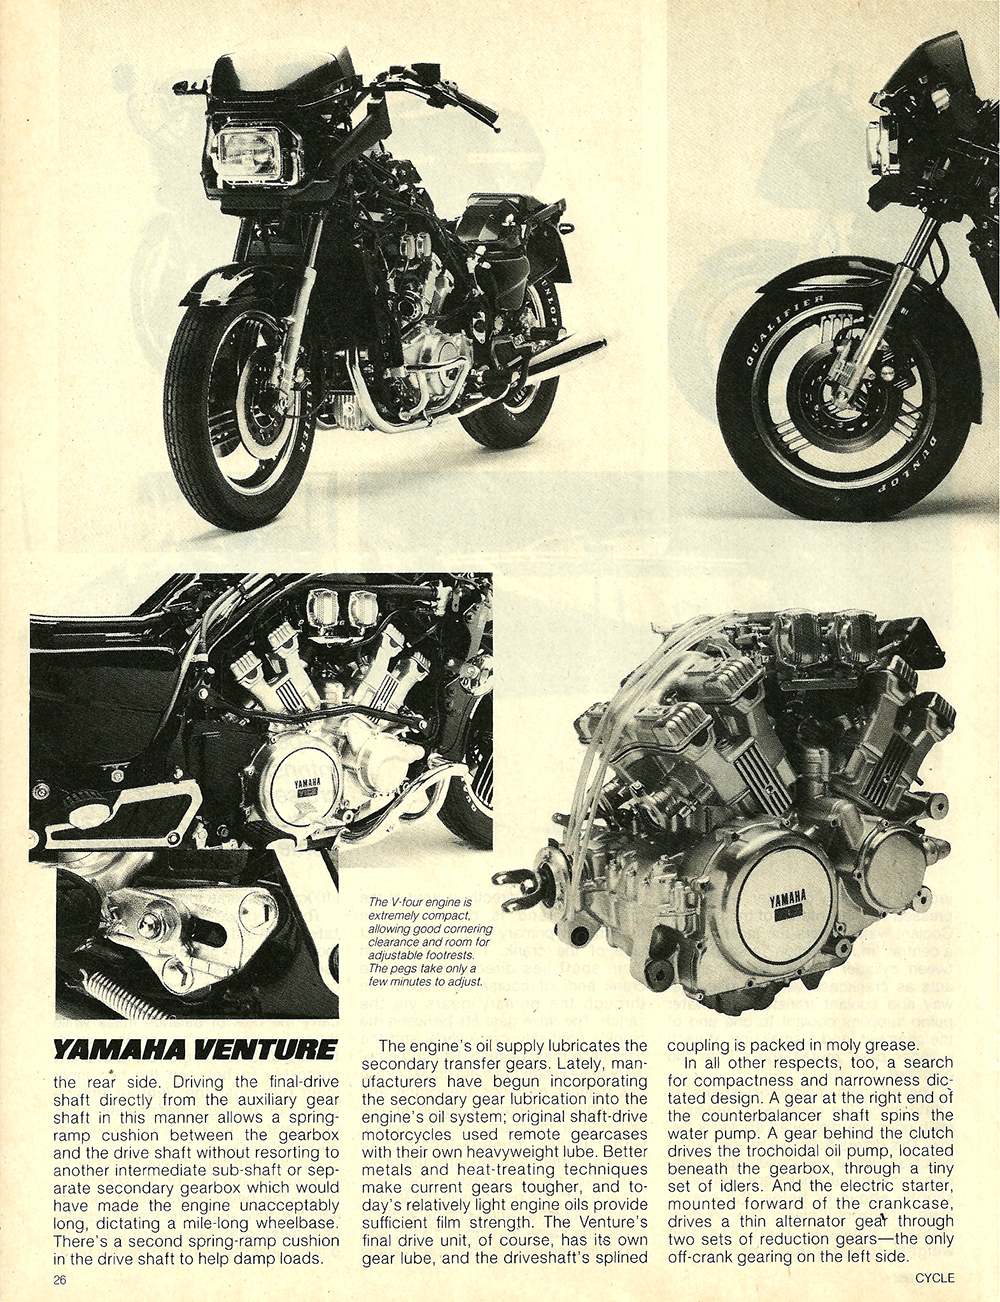 1983 Yamaha XVZ12TK Venture road test 05.jpg